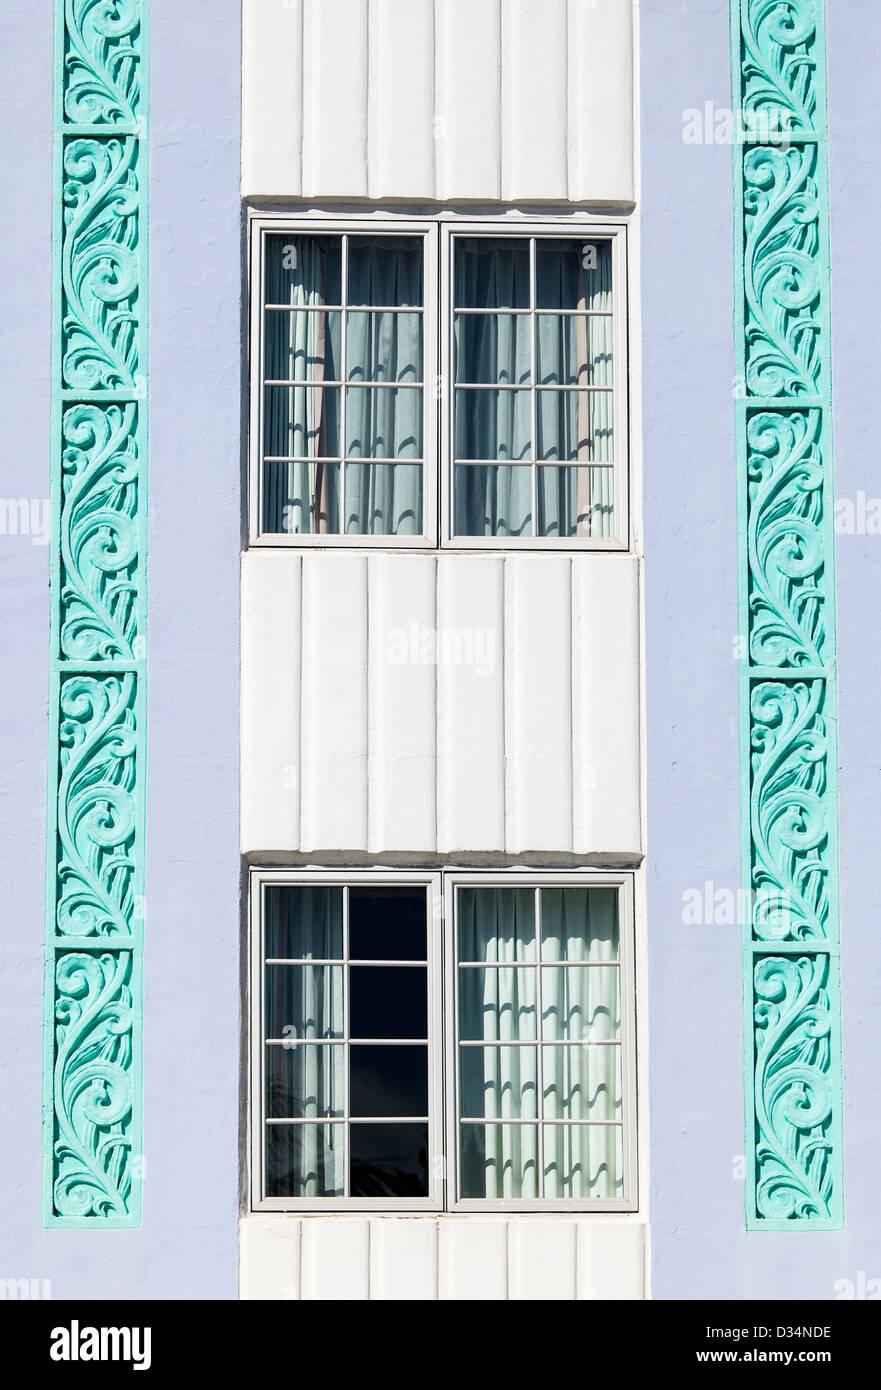 Detail of two Windows, Art Deco District, South Beach, Miami Beach, USA - Stock Image